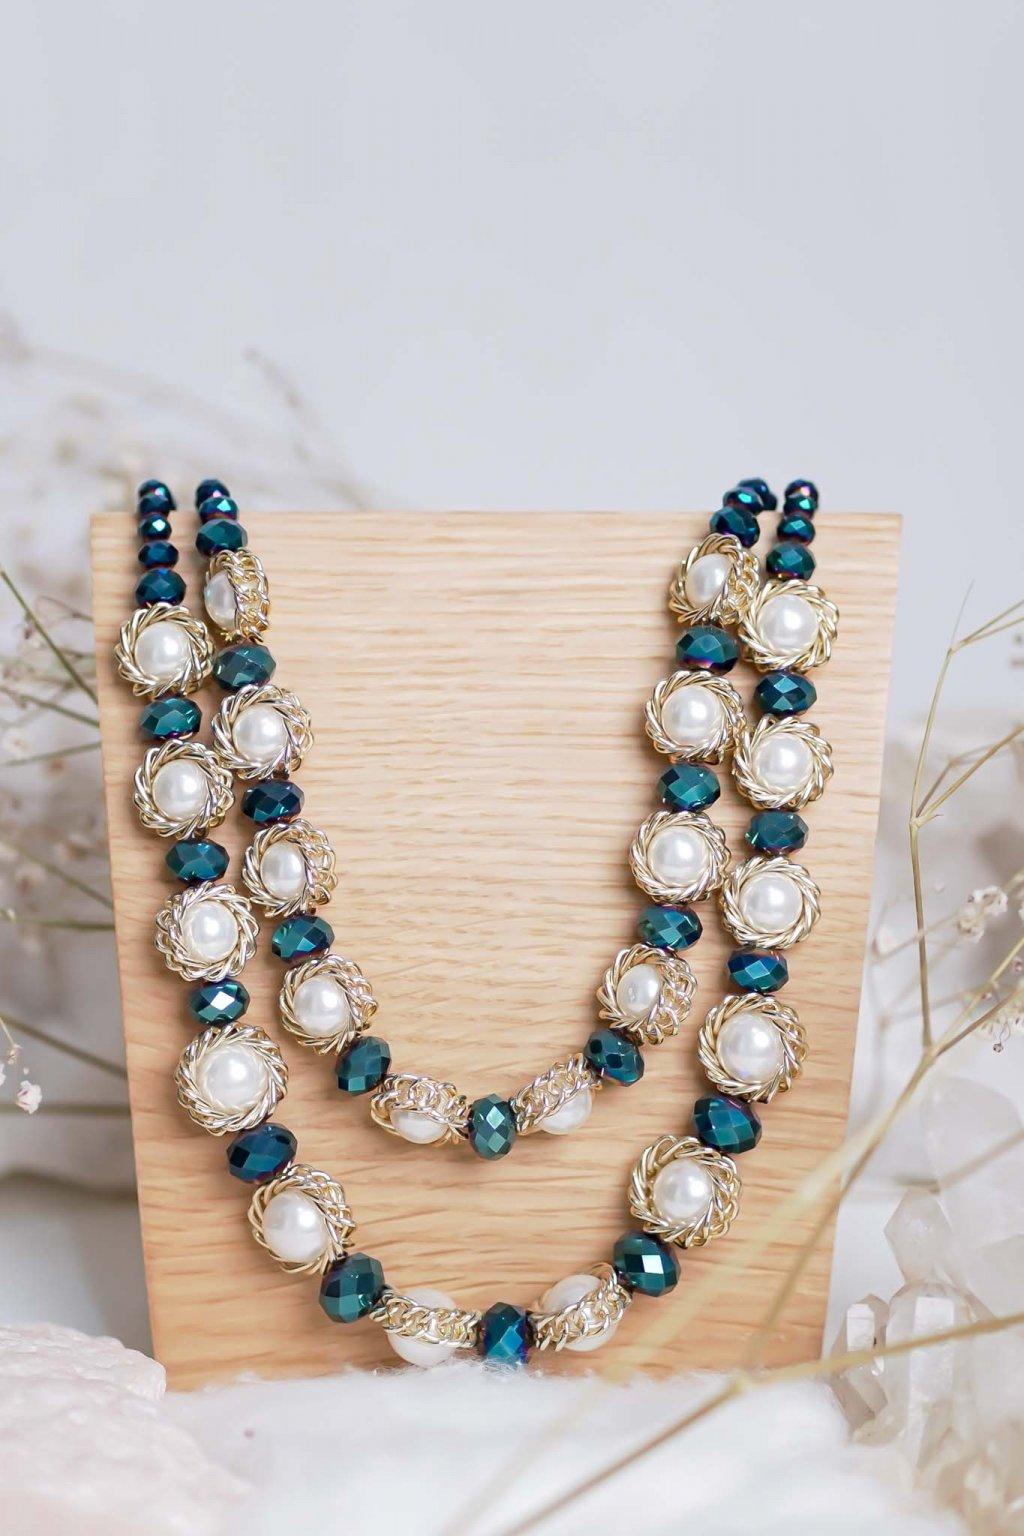 náhrdelník, šperk, spoločenská náhrdelník, náhrdelník na bežný deň, výrazný náhrdelník, jemný náhrdelník, šperky, náhrdelník na ples, svadbu, stužkovú 13